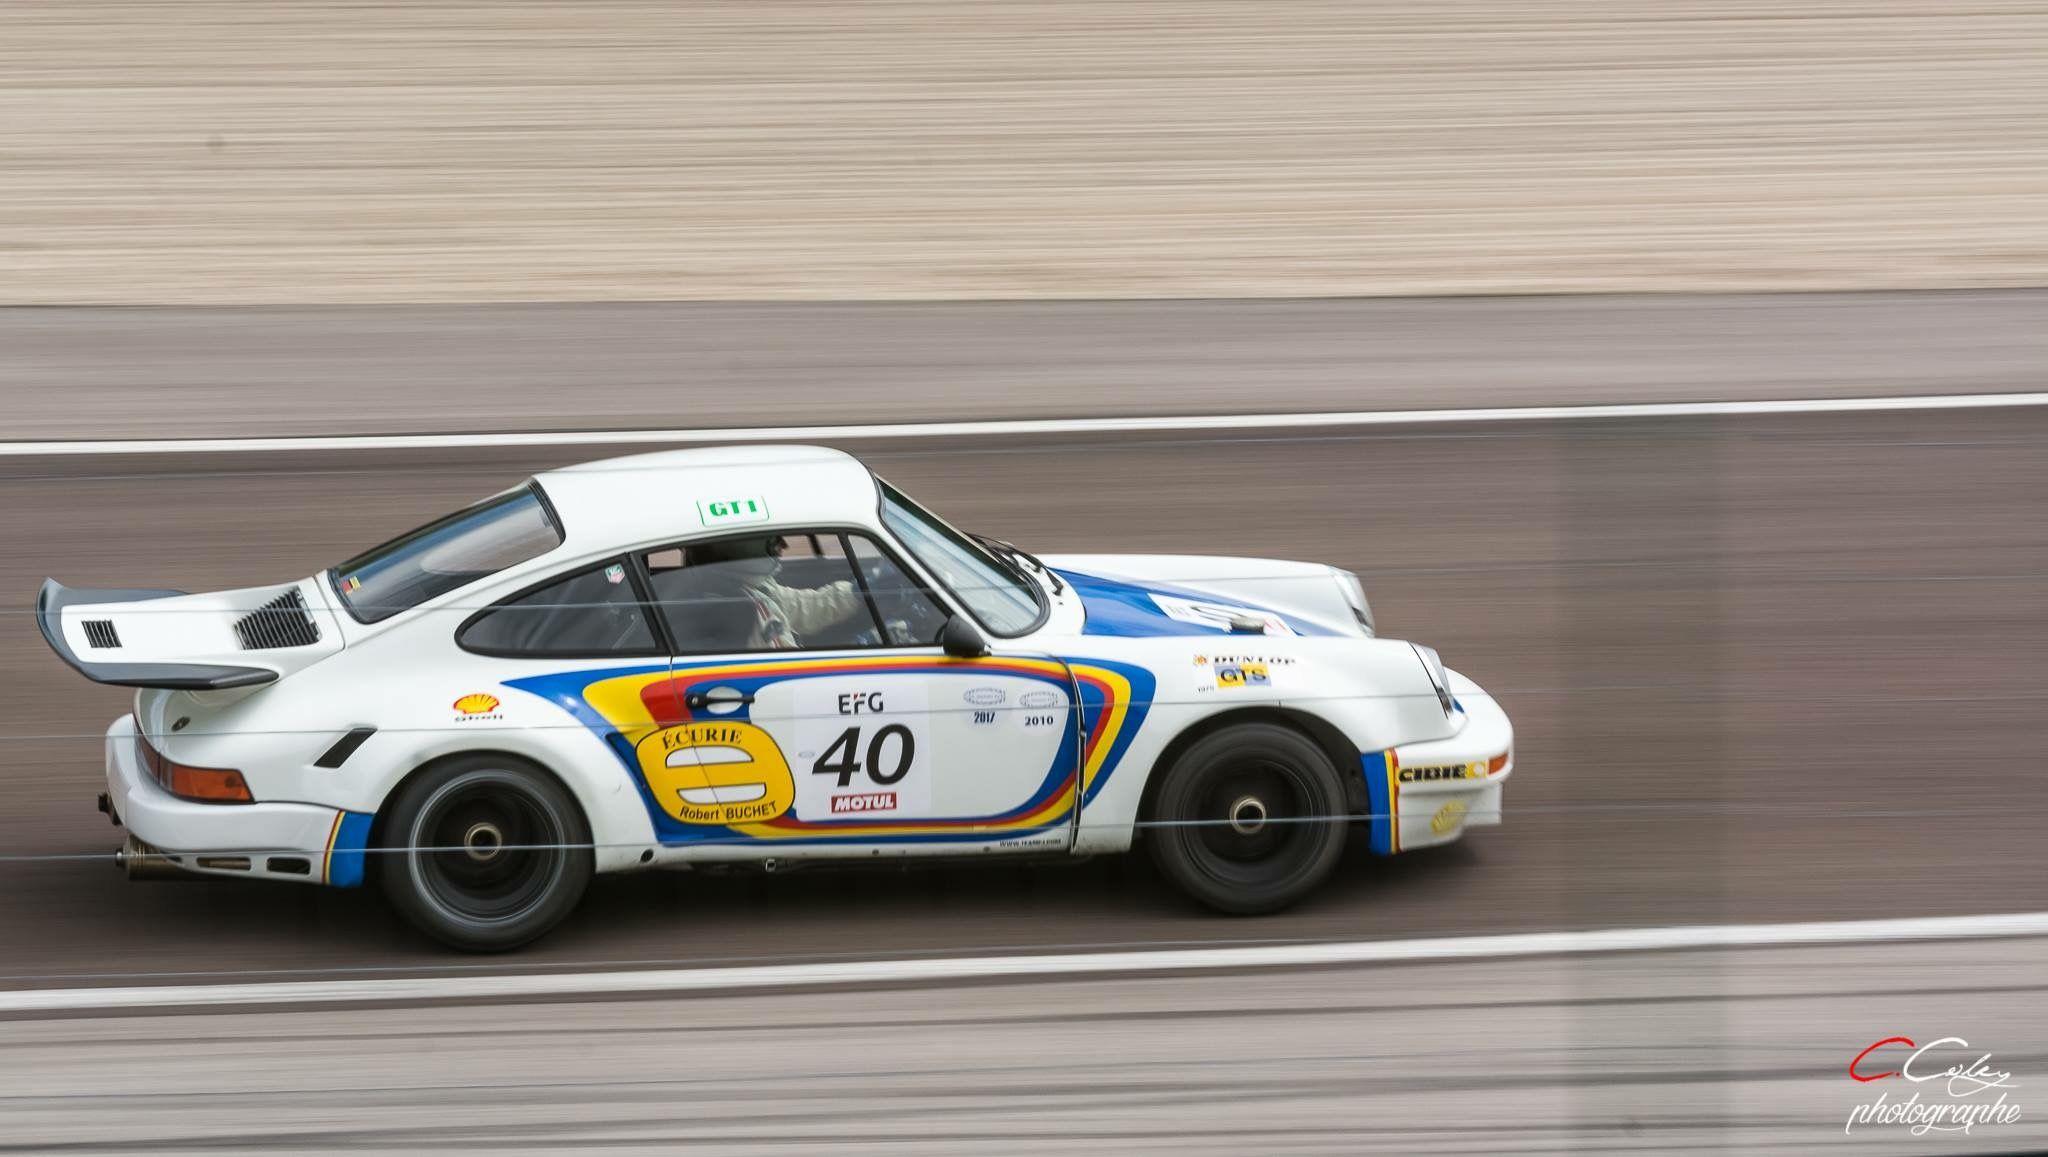 Pin By Patton On Cars I Want Porsche Porsche 911 Cars